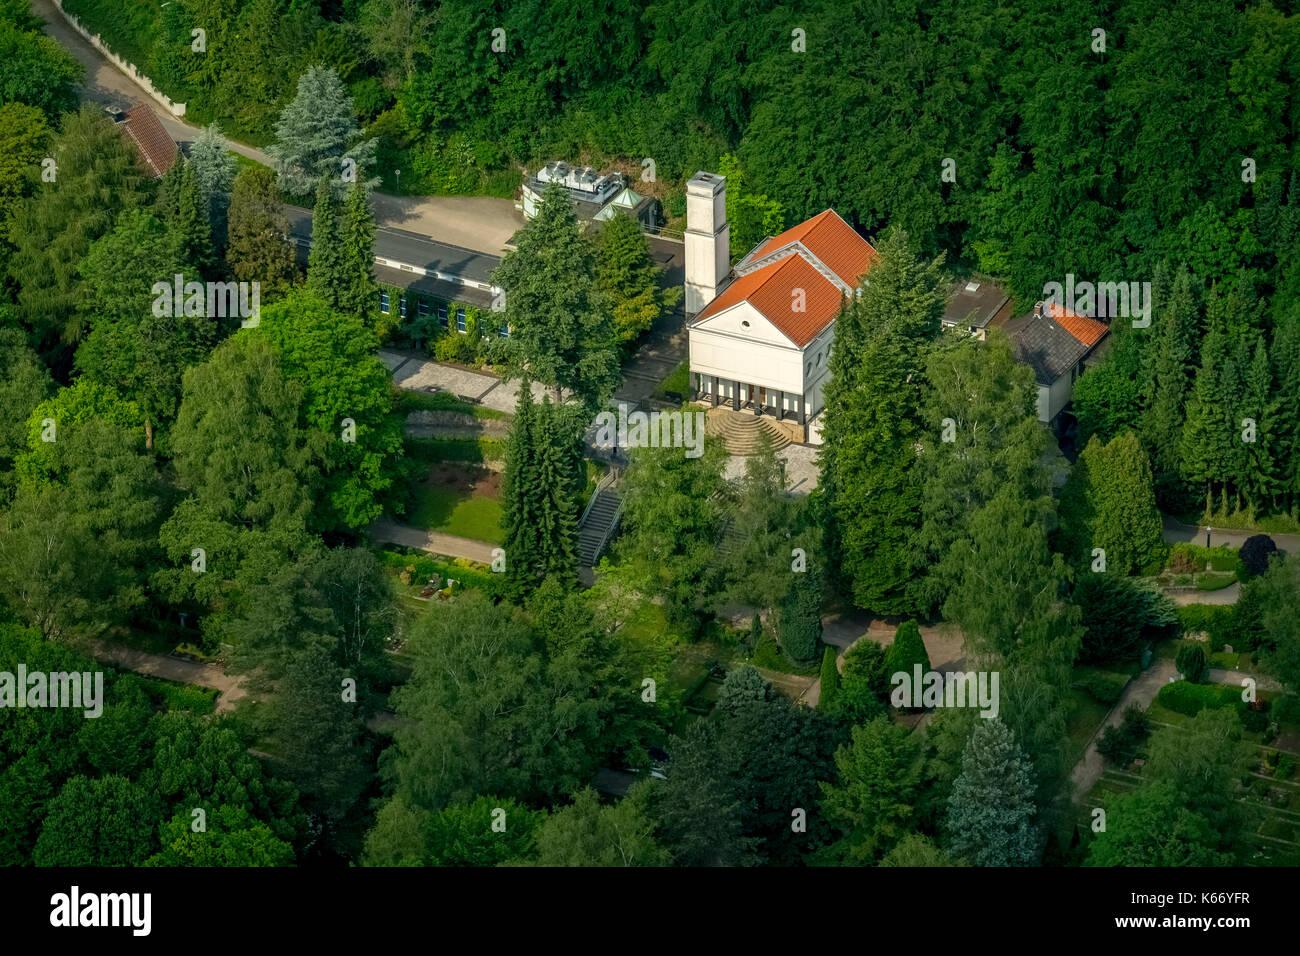 ,Eduard-Mueller crematorium, delstern, memorial, Krematirium Hagen, Hagen, Ruhr area, North Rhine-Westphalia, Germany, Europe, Hagen, Hagensueden, aer - Stock Image